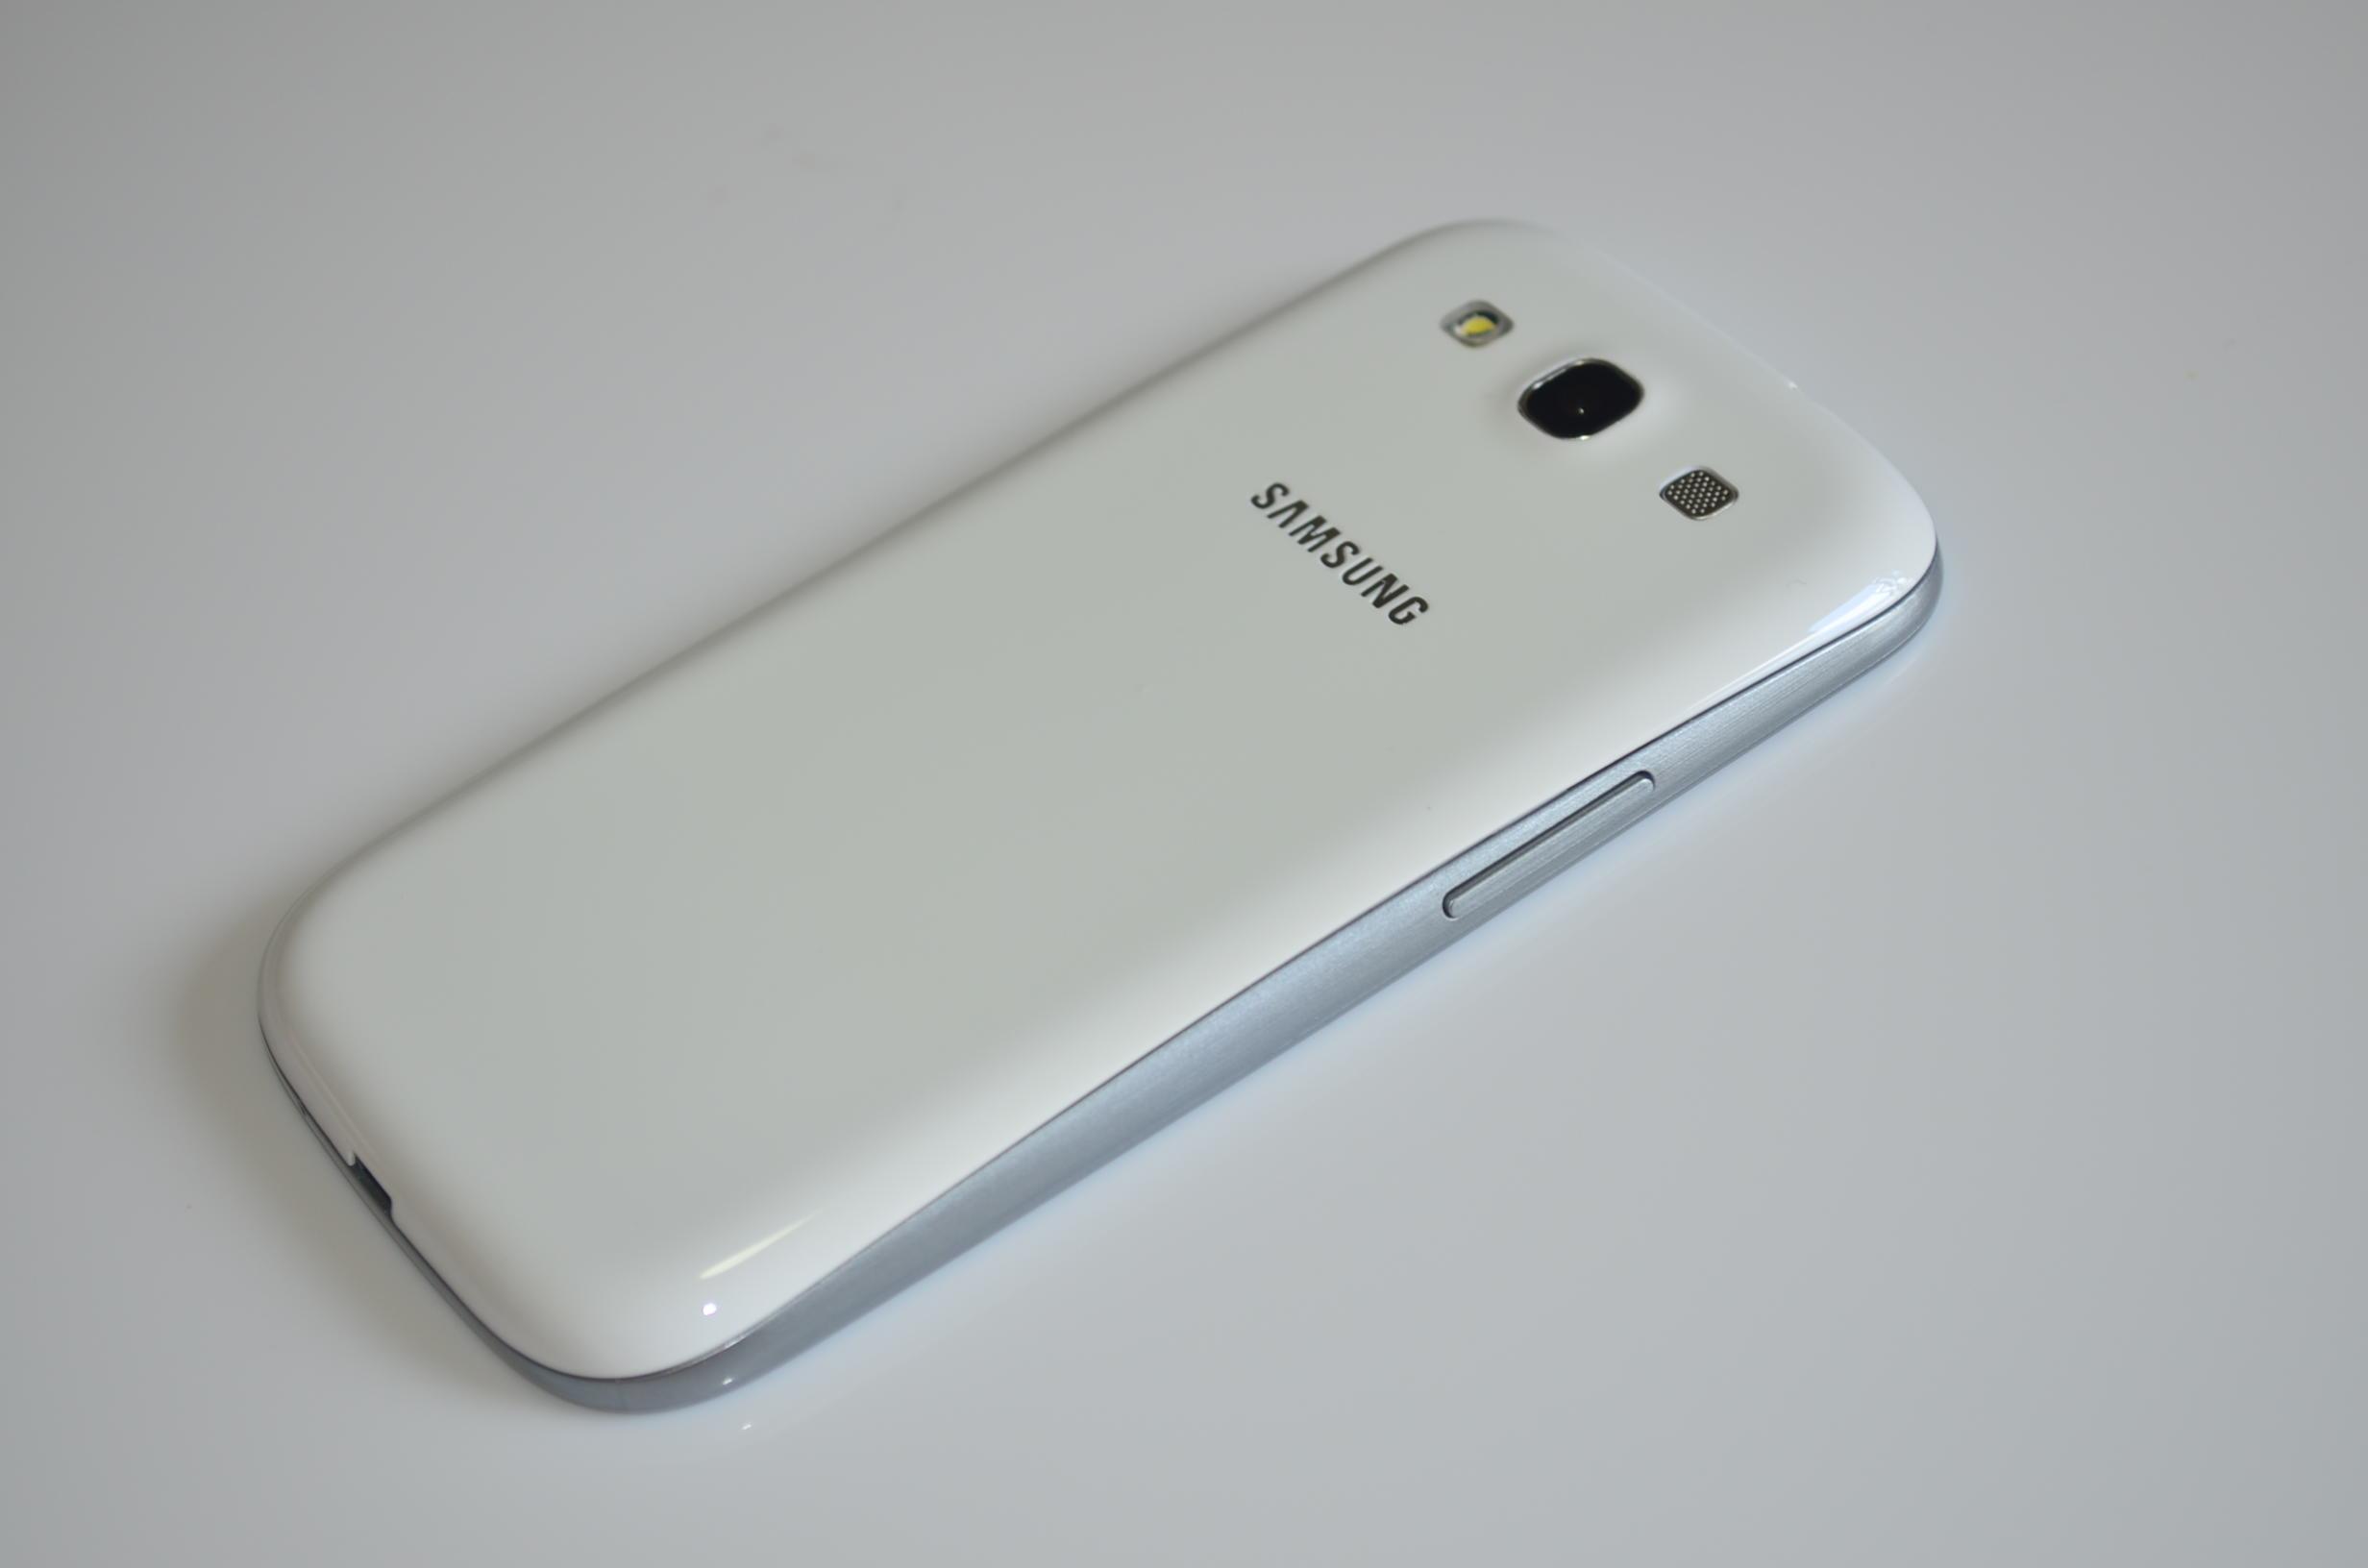 Samsung Galaxy S3 - Технические характеристики